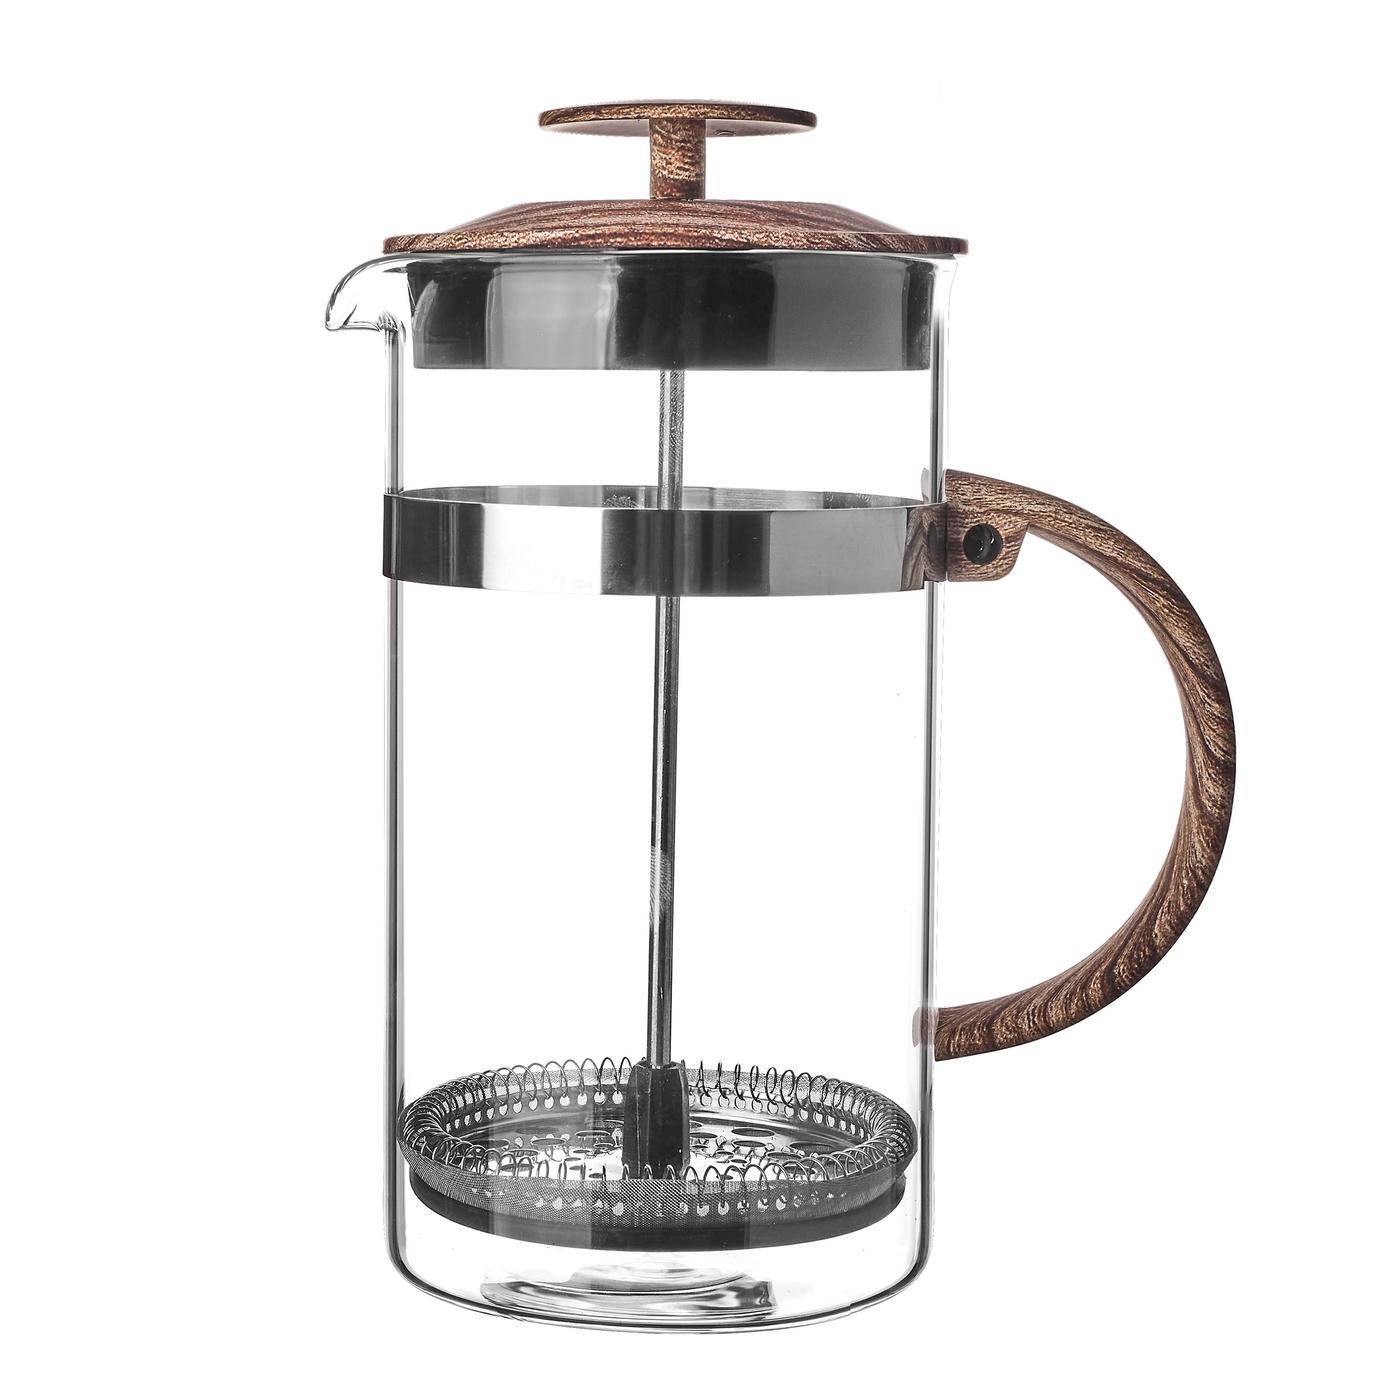 konvice 1,0l VENGA, COFFEE MAKER, sklo+NR+plast